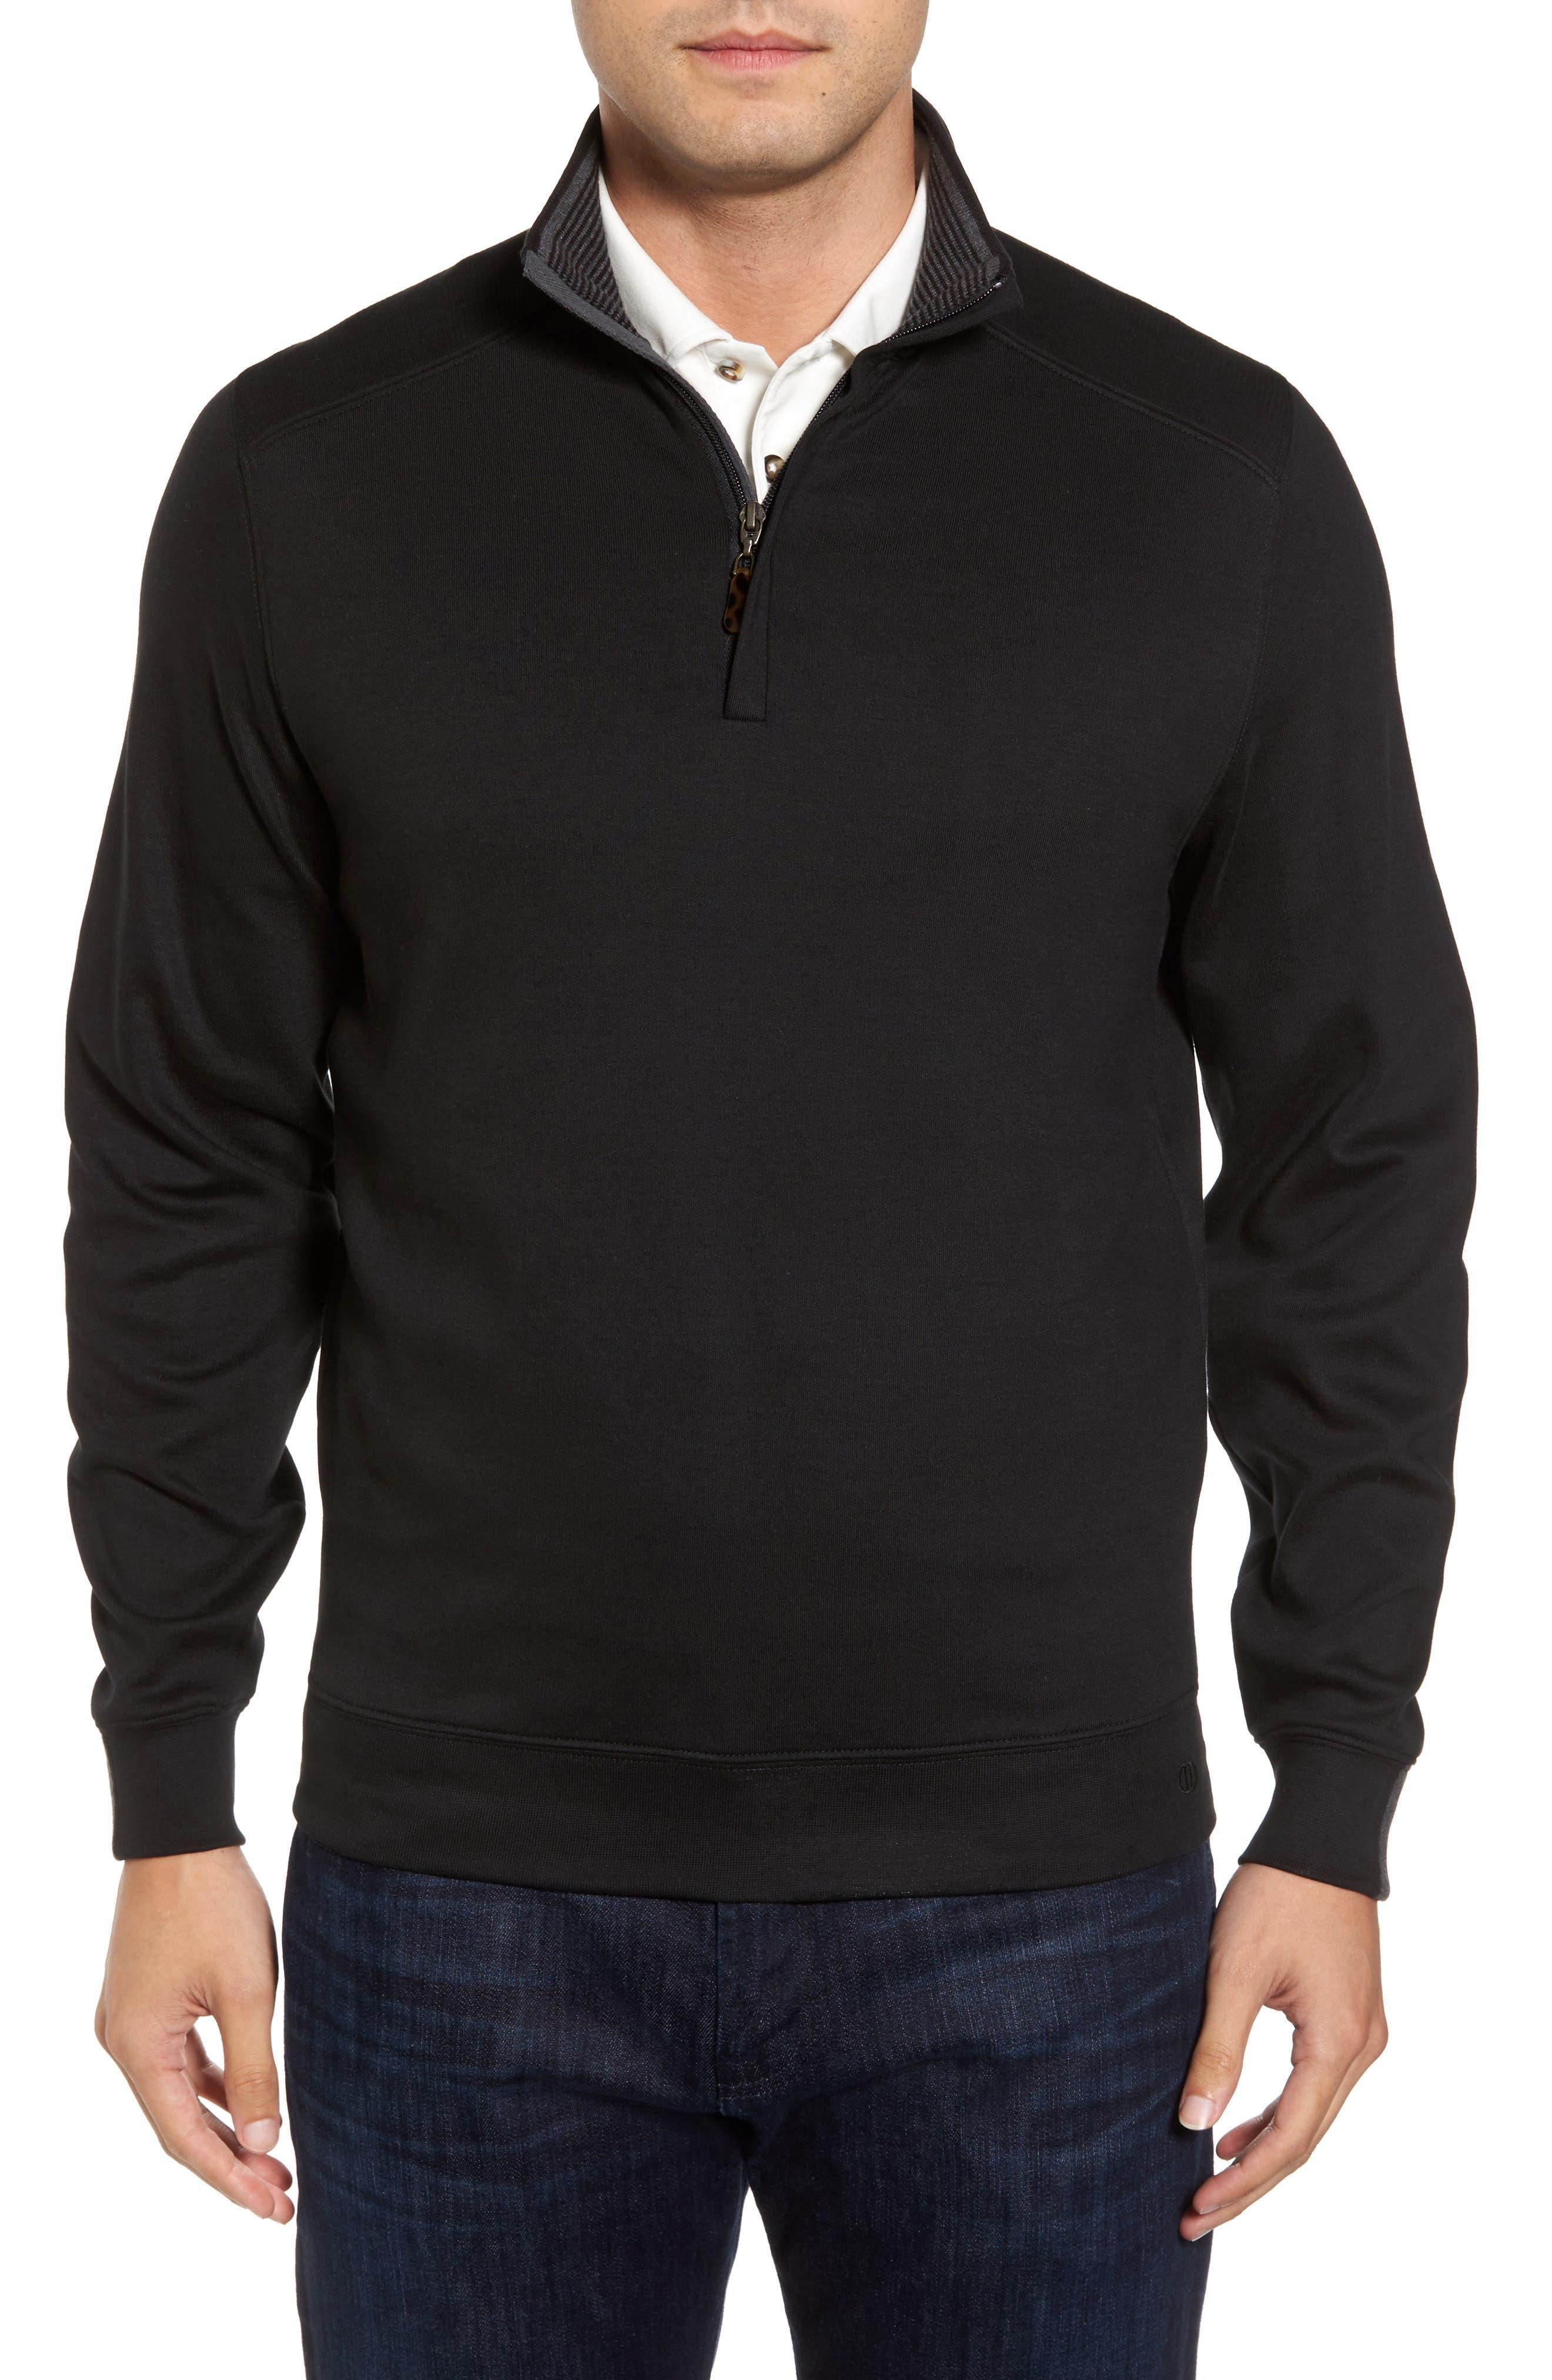 Interlock Knit Quarter Zip Pullover,                             Main thumbnail 1, color,                             Black